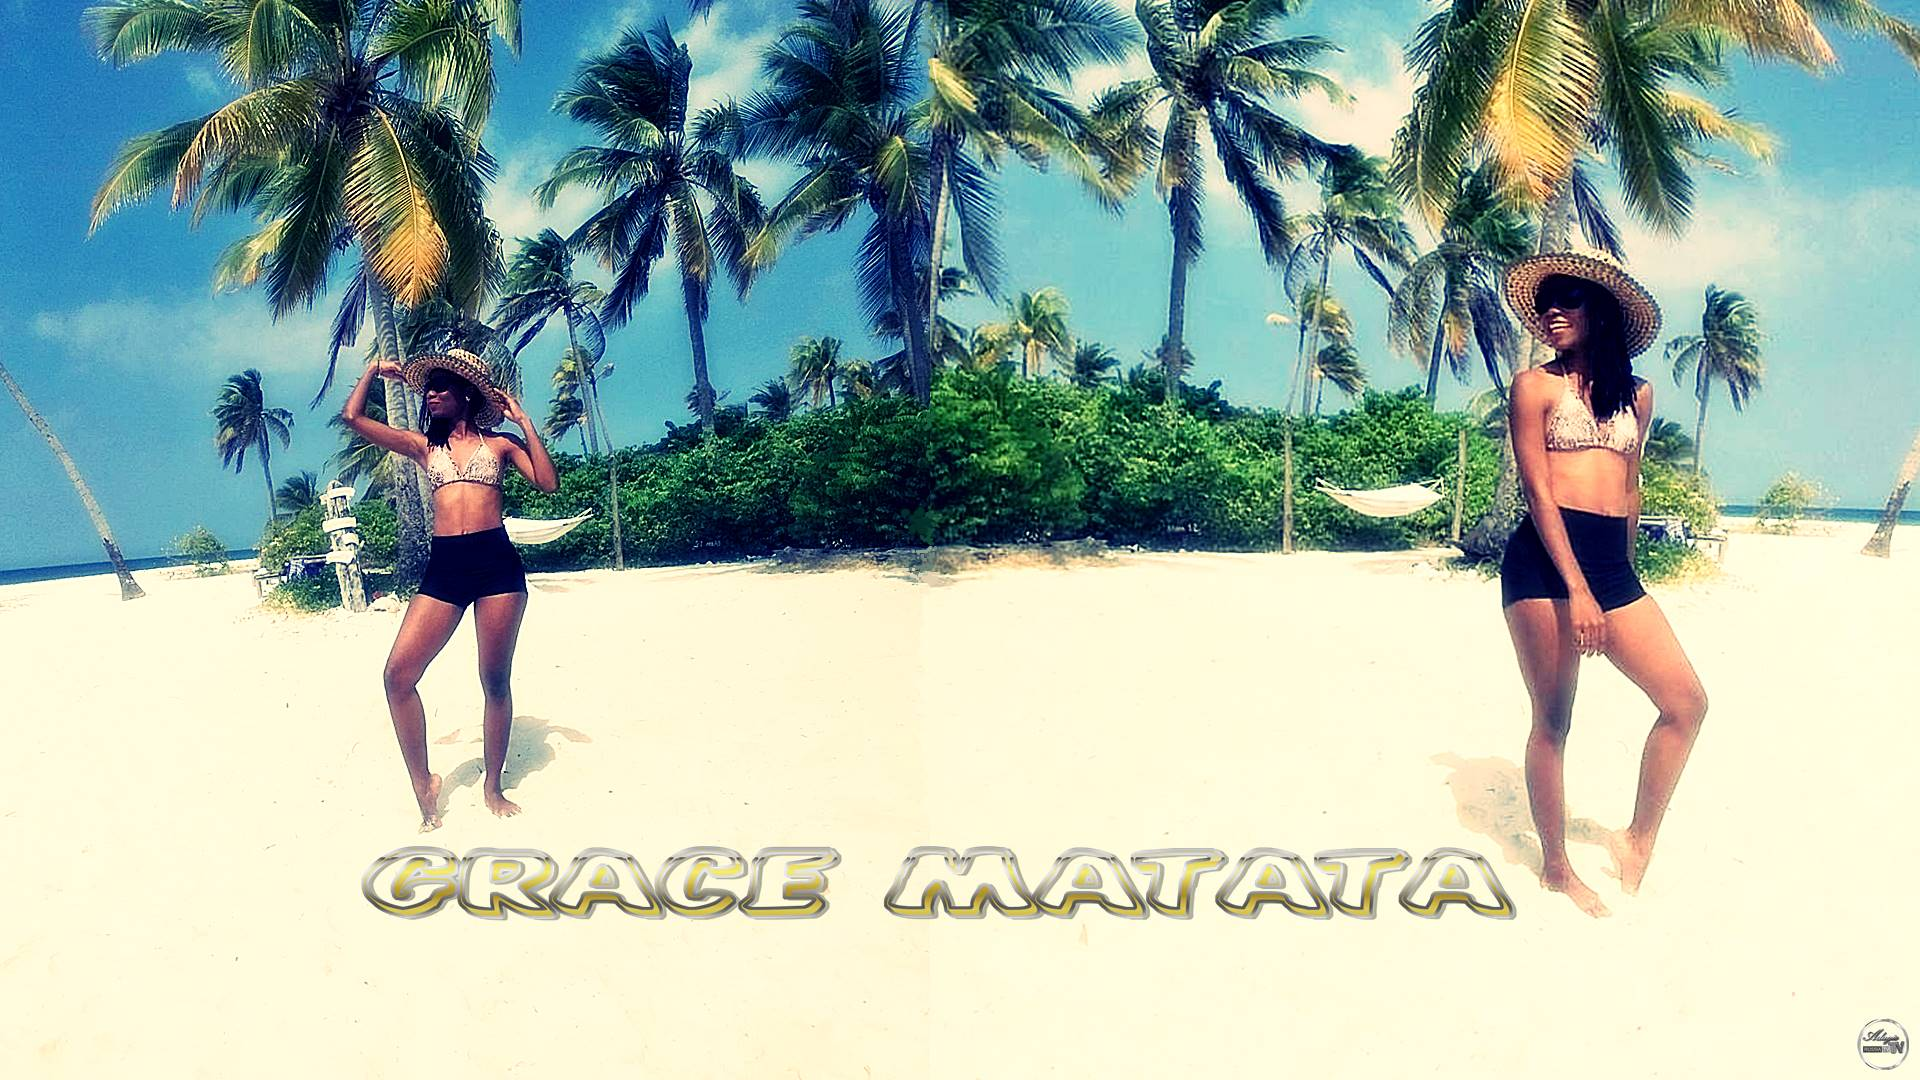 Grace Matata